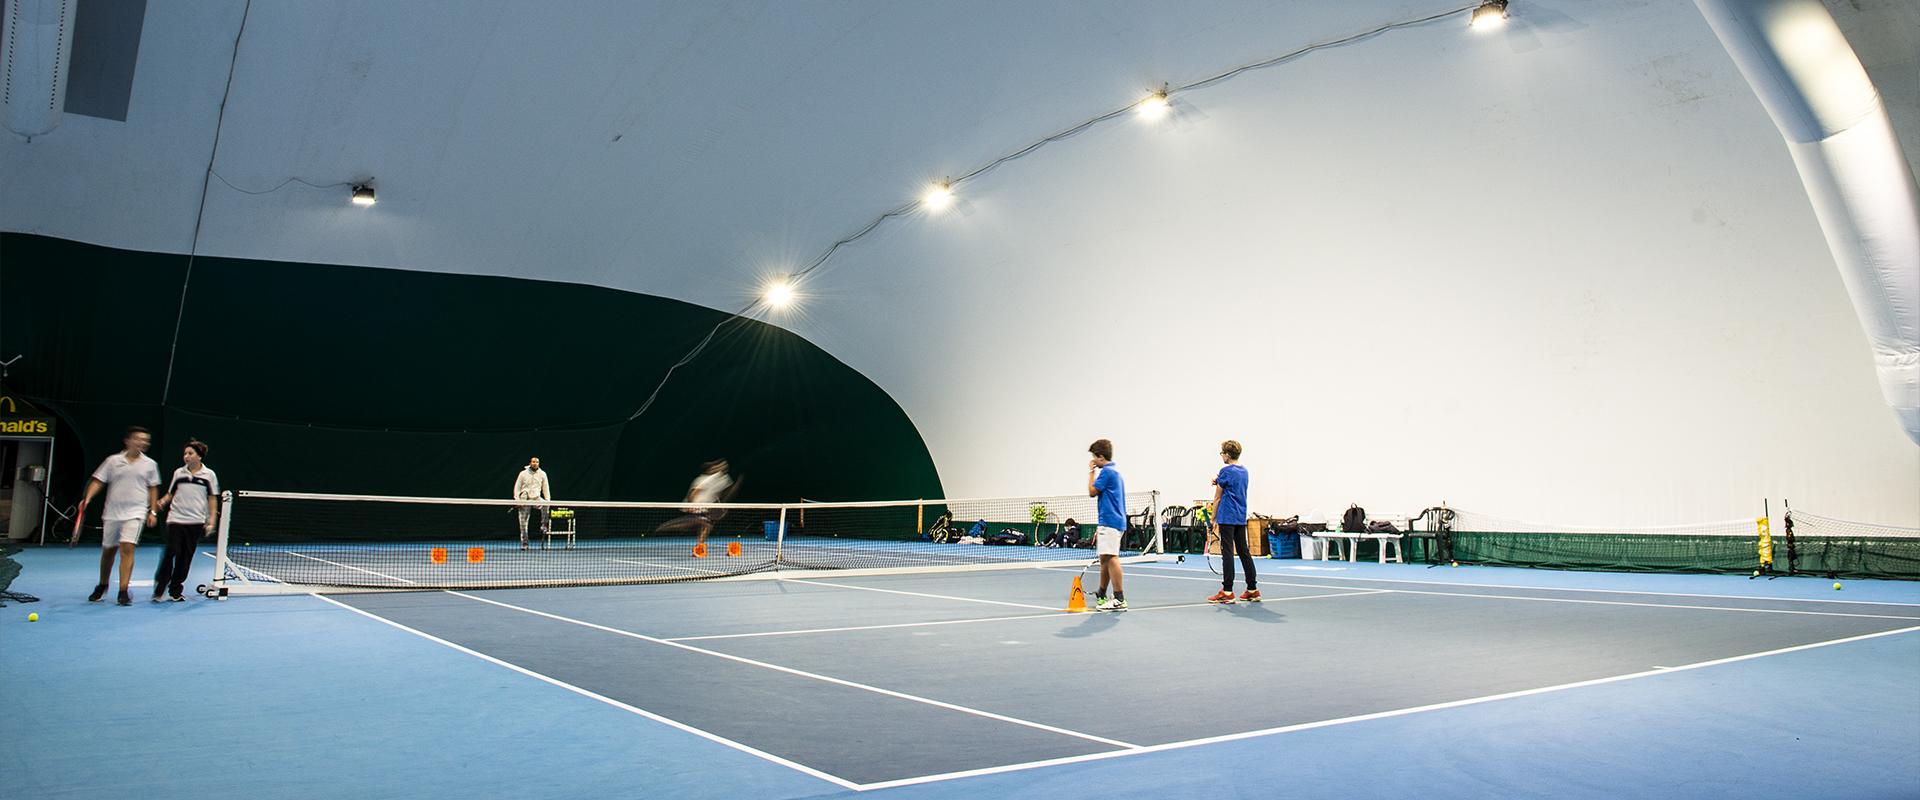 Fari LED tennis